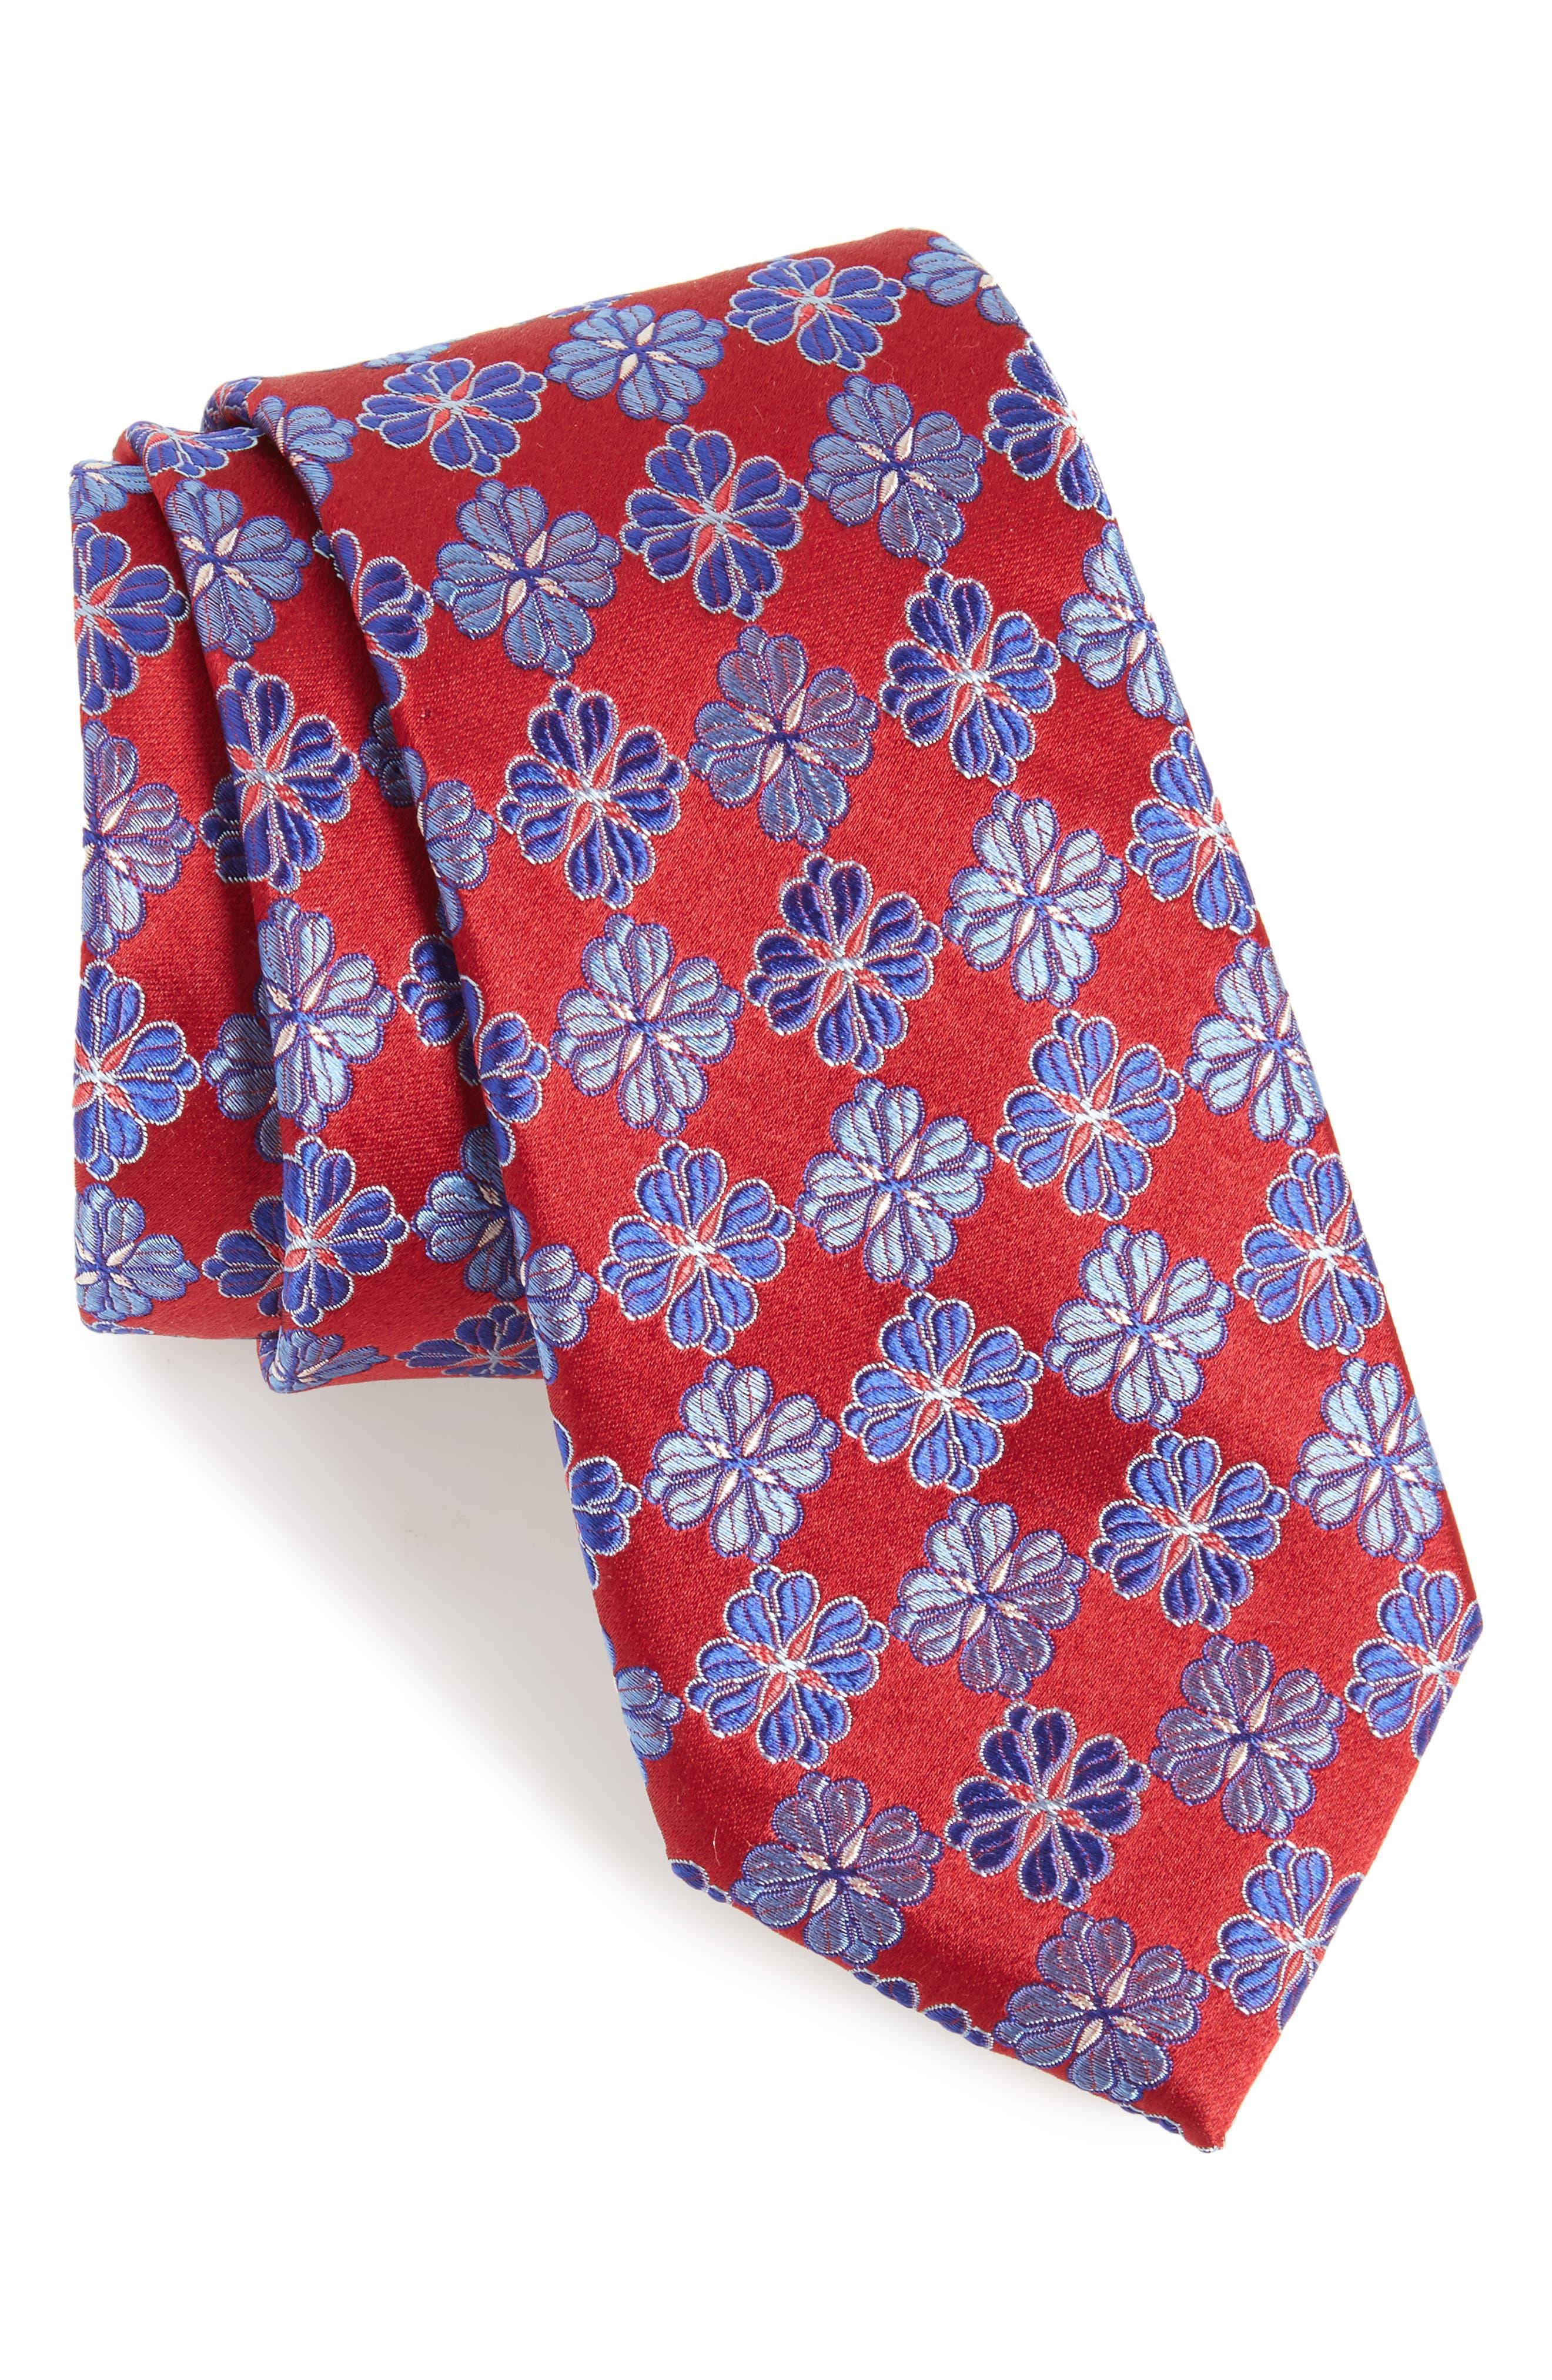 Main Image - Nordstrom Men's Shop Cole Floral Silk Tie